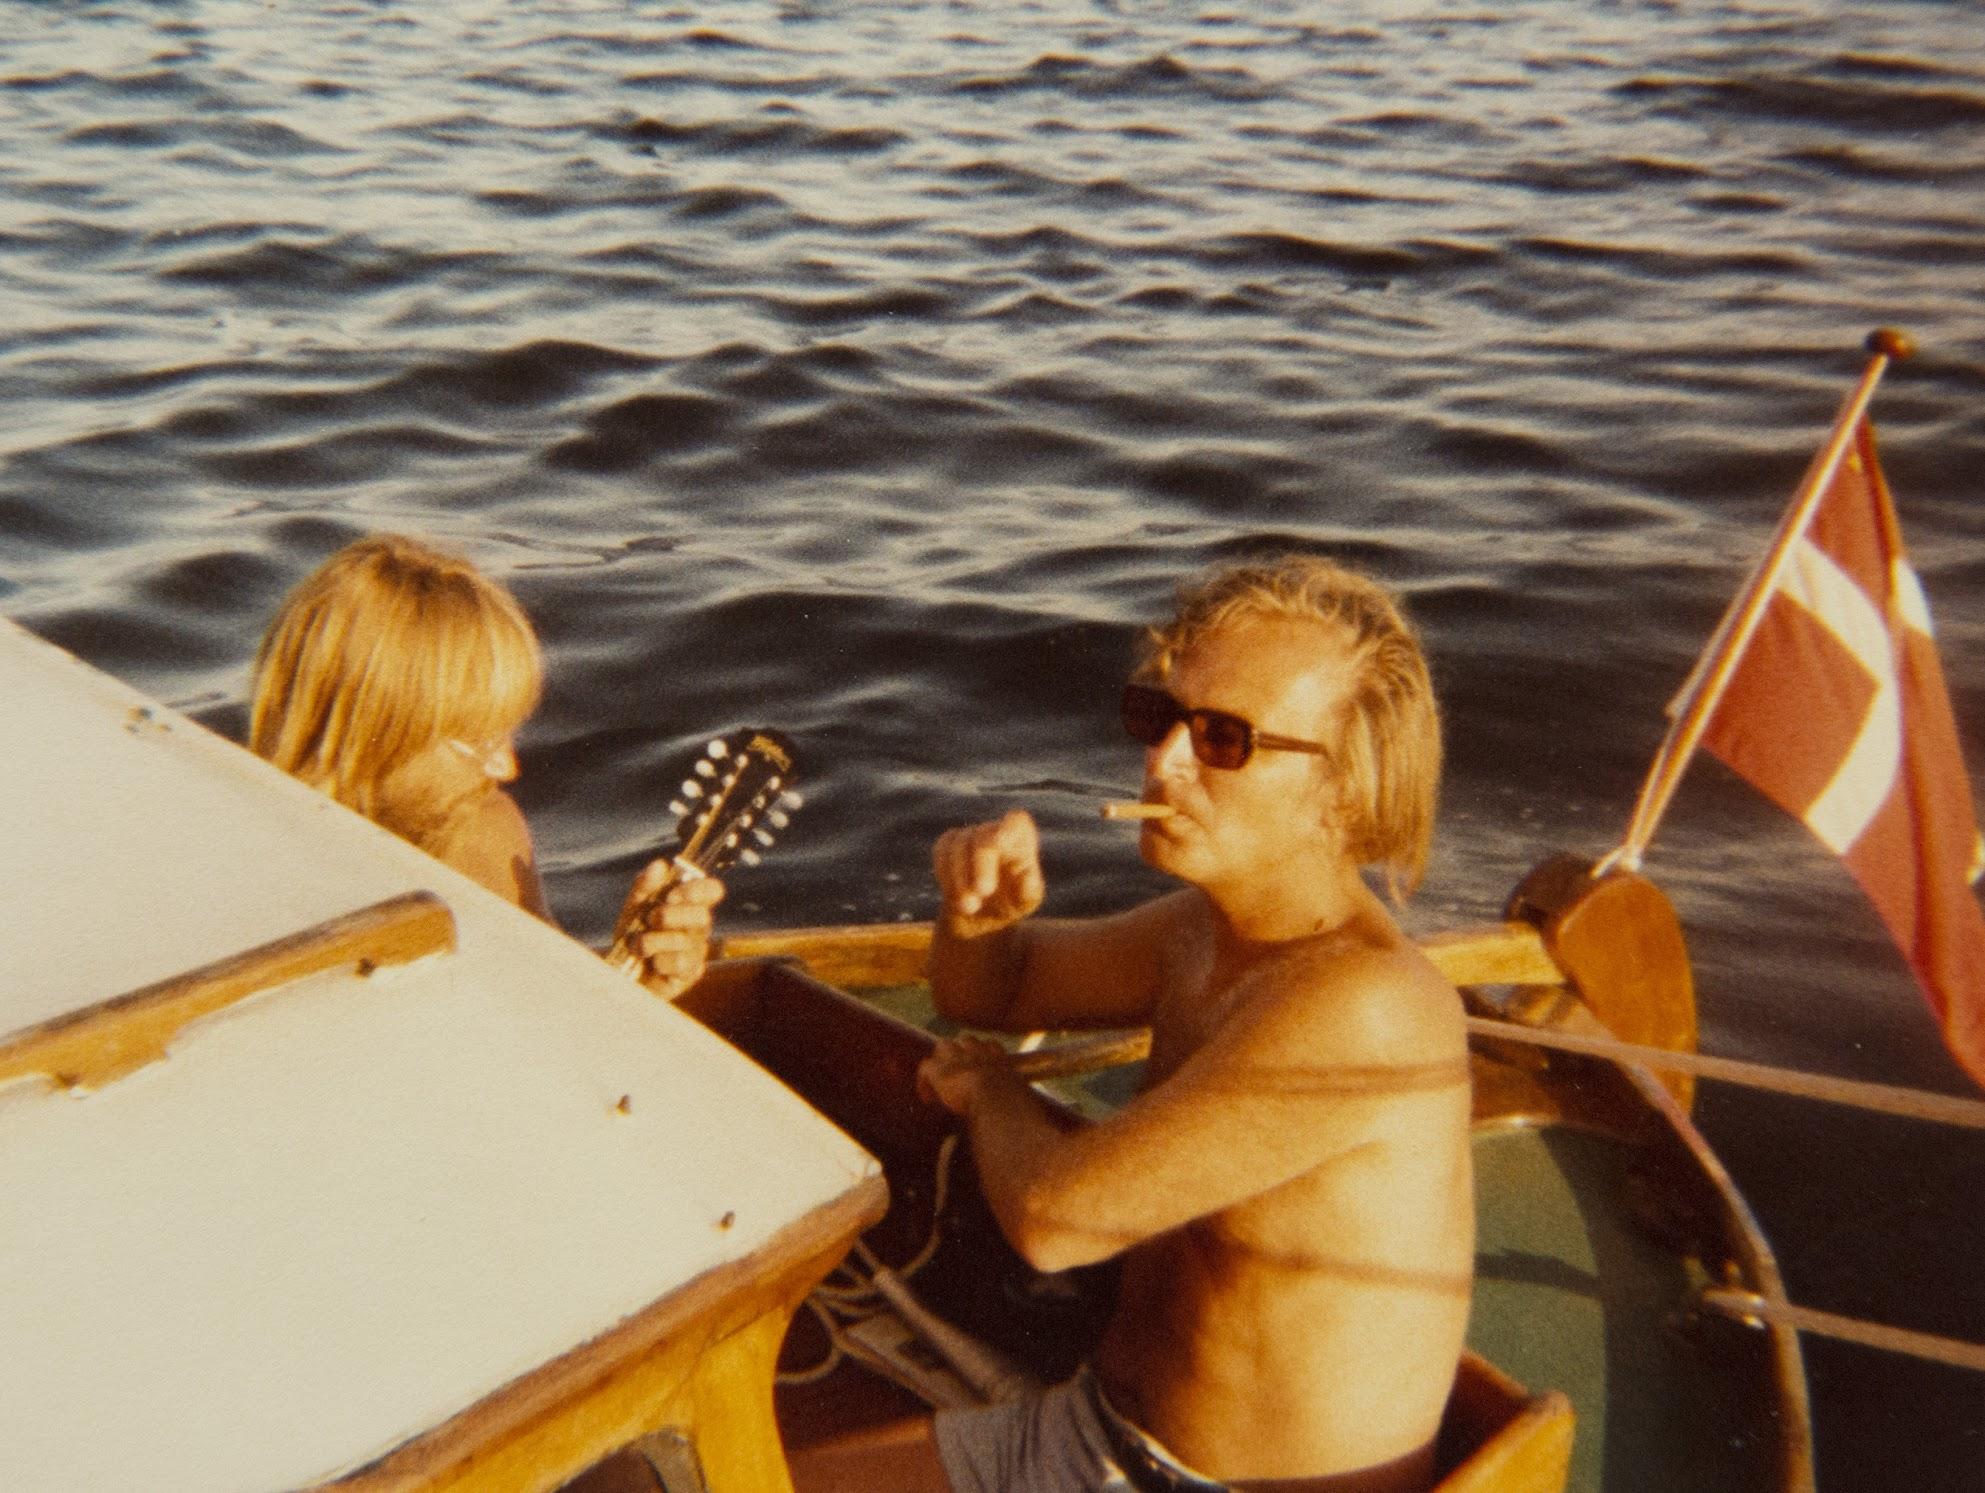 Curt Sørensen og Helge på båden Bjørn. Privatfoto.